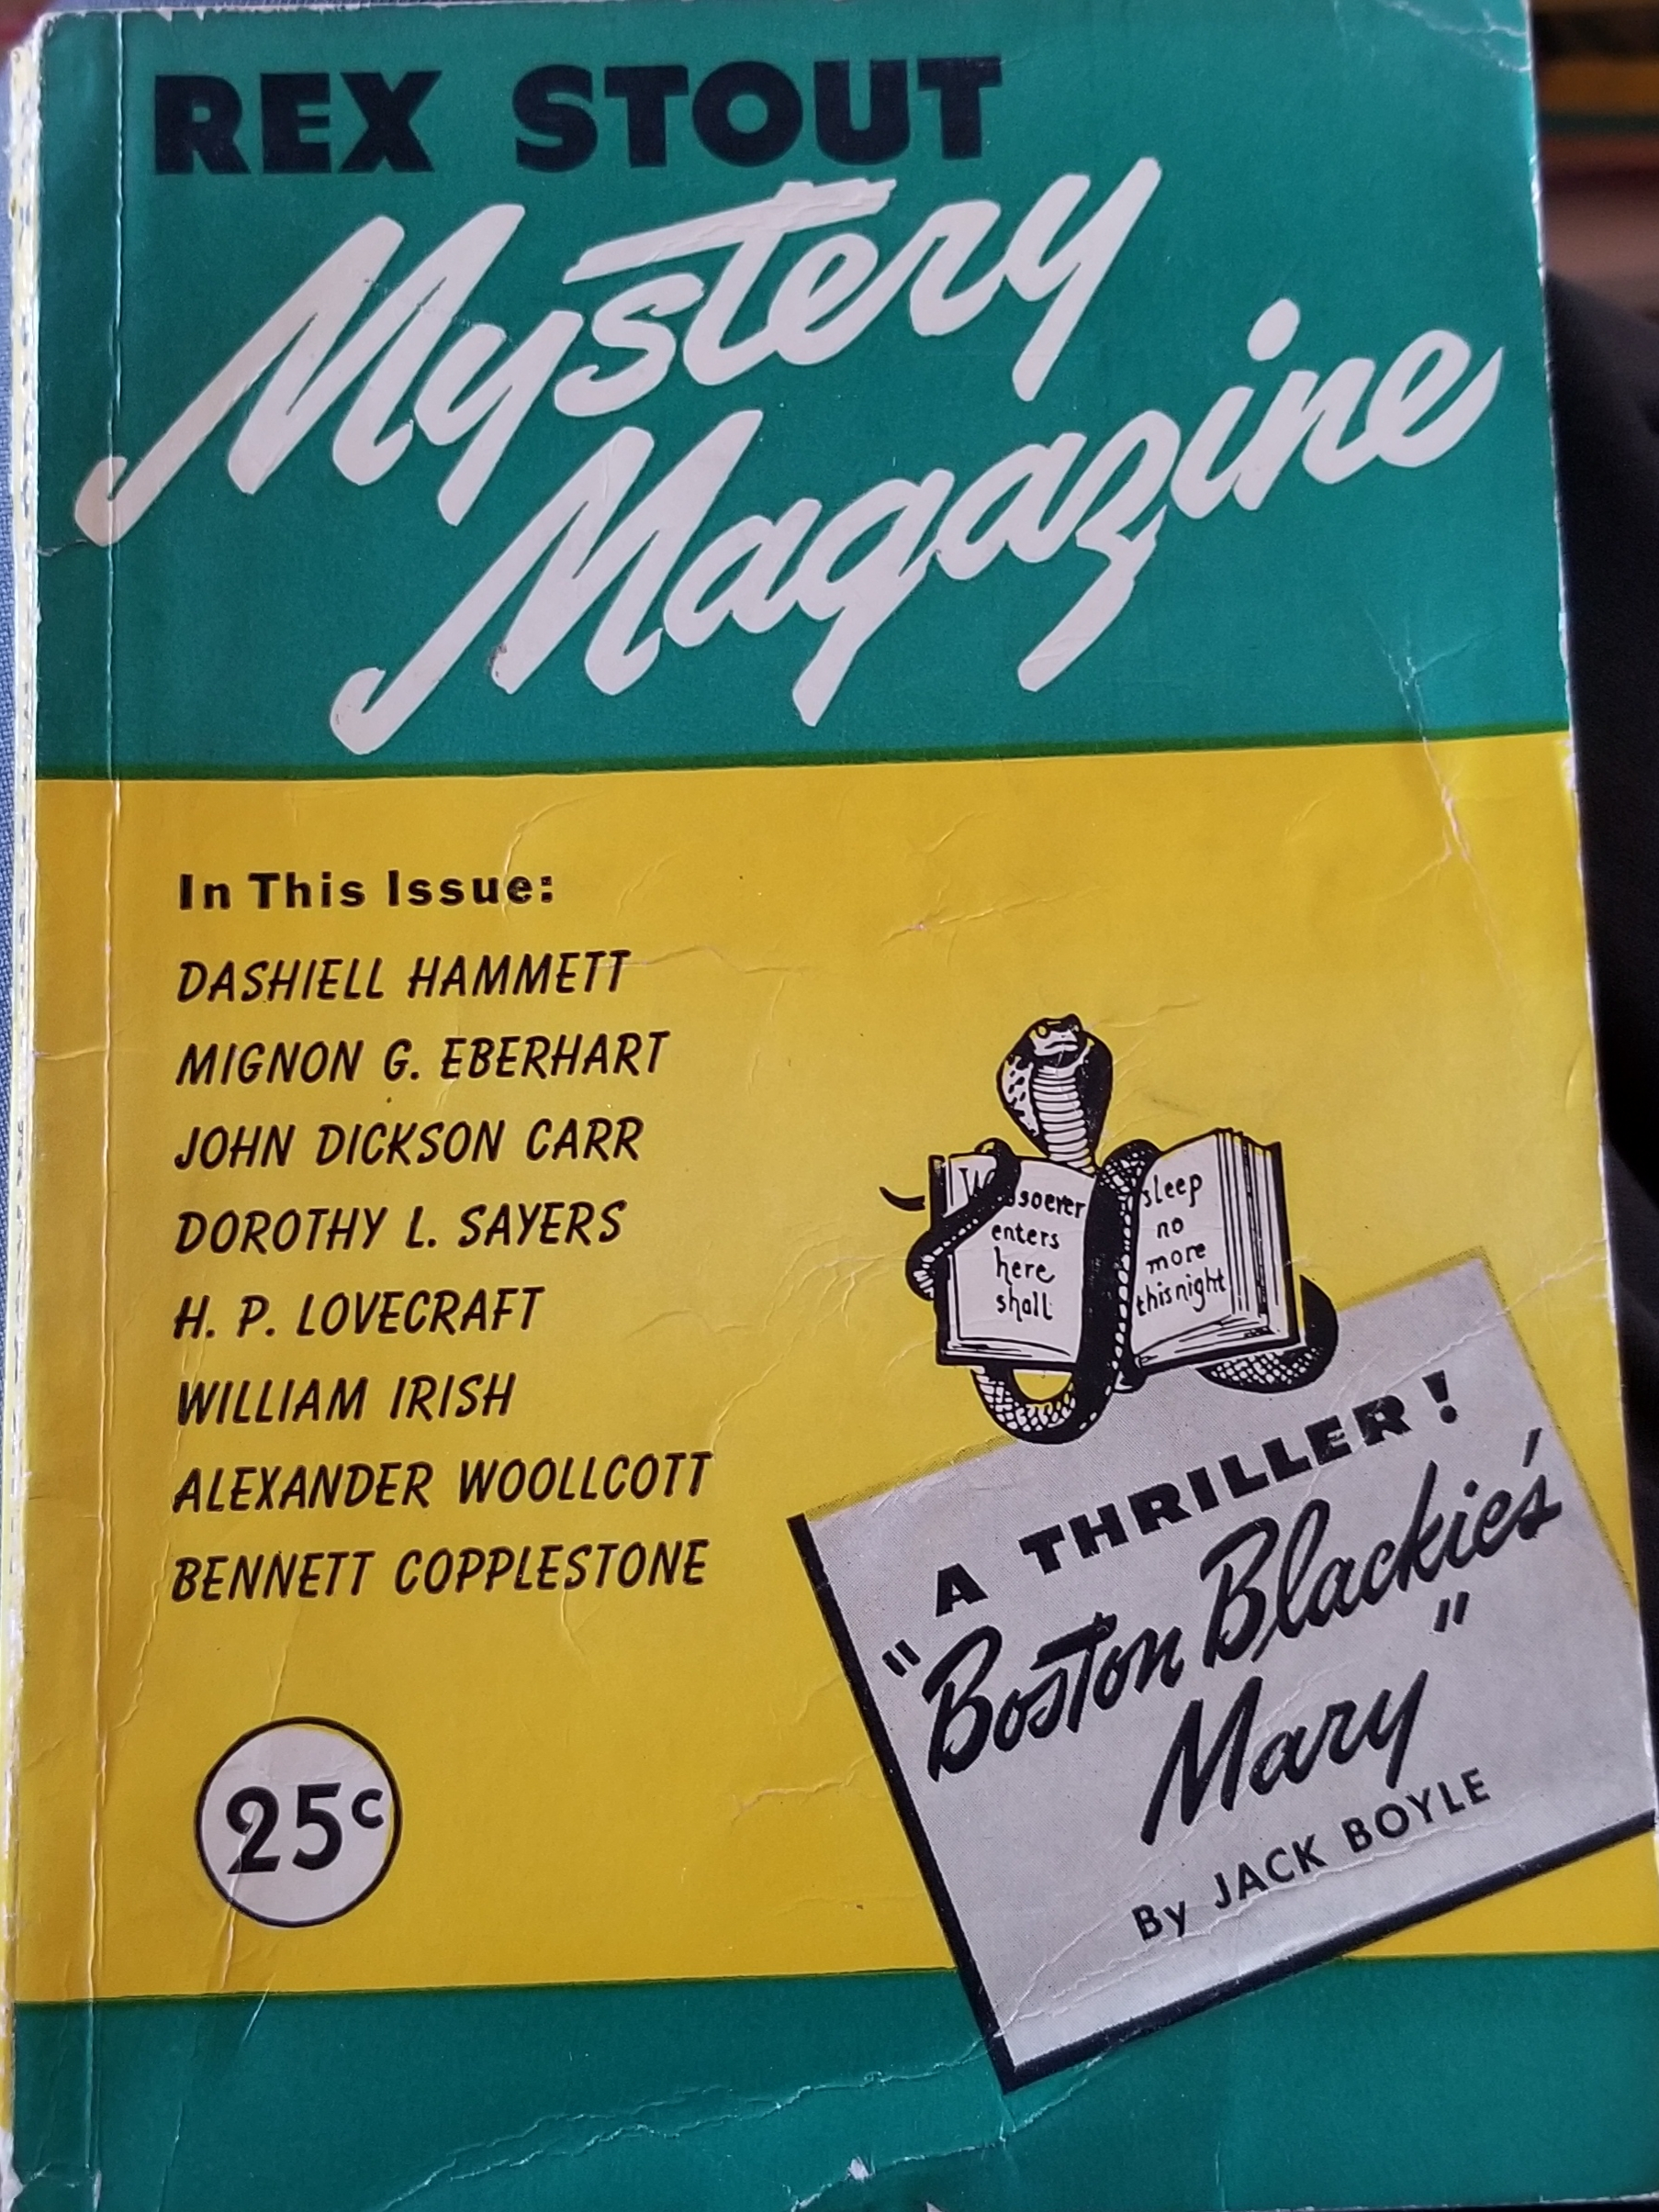 Rex Stout Mystery Magazine No. 3